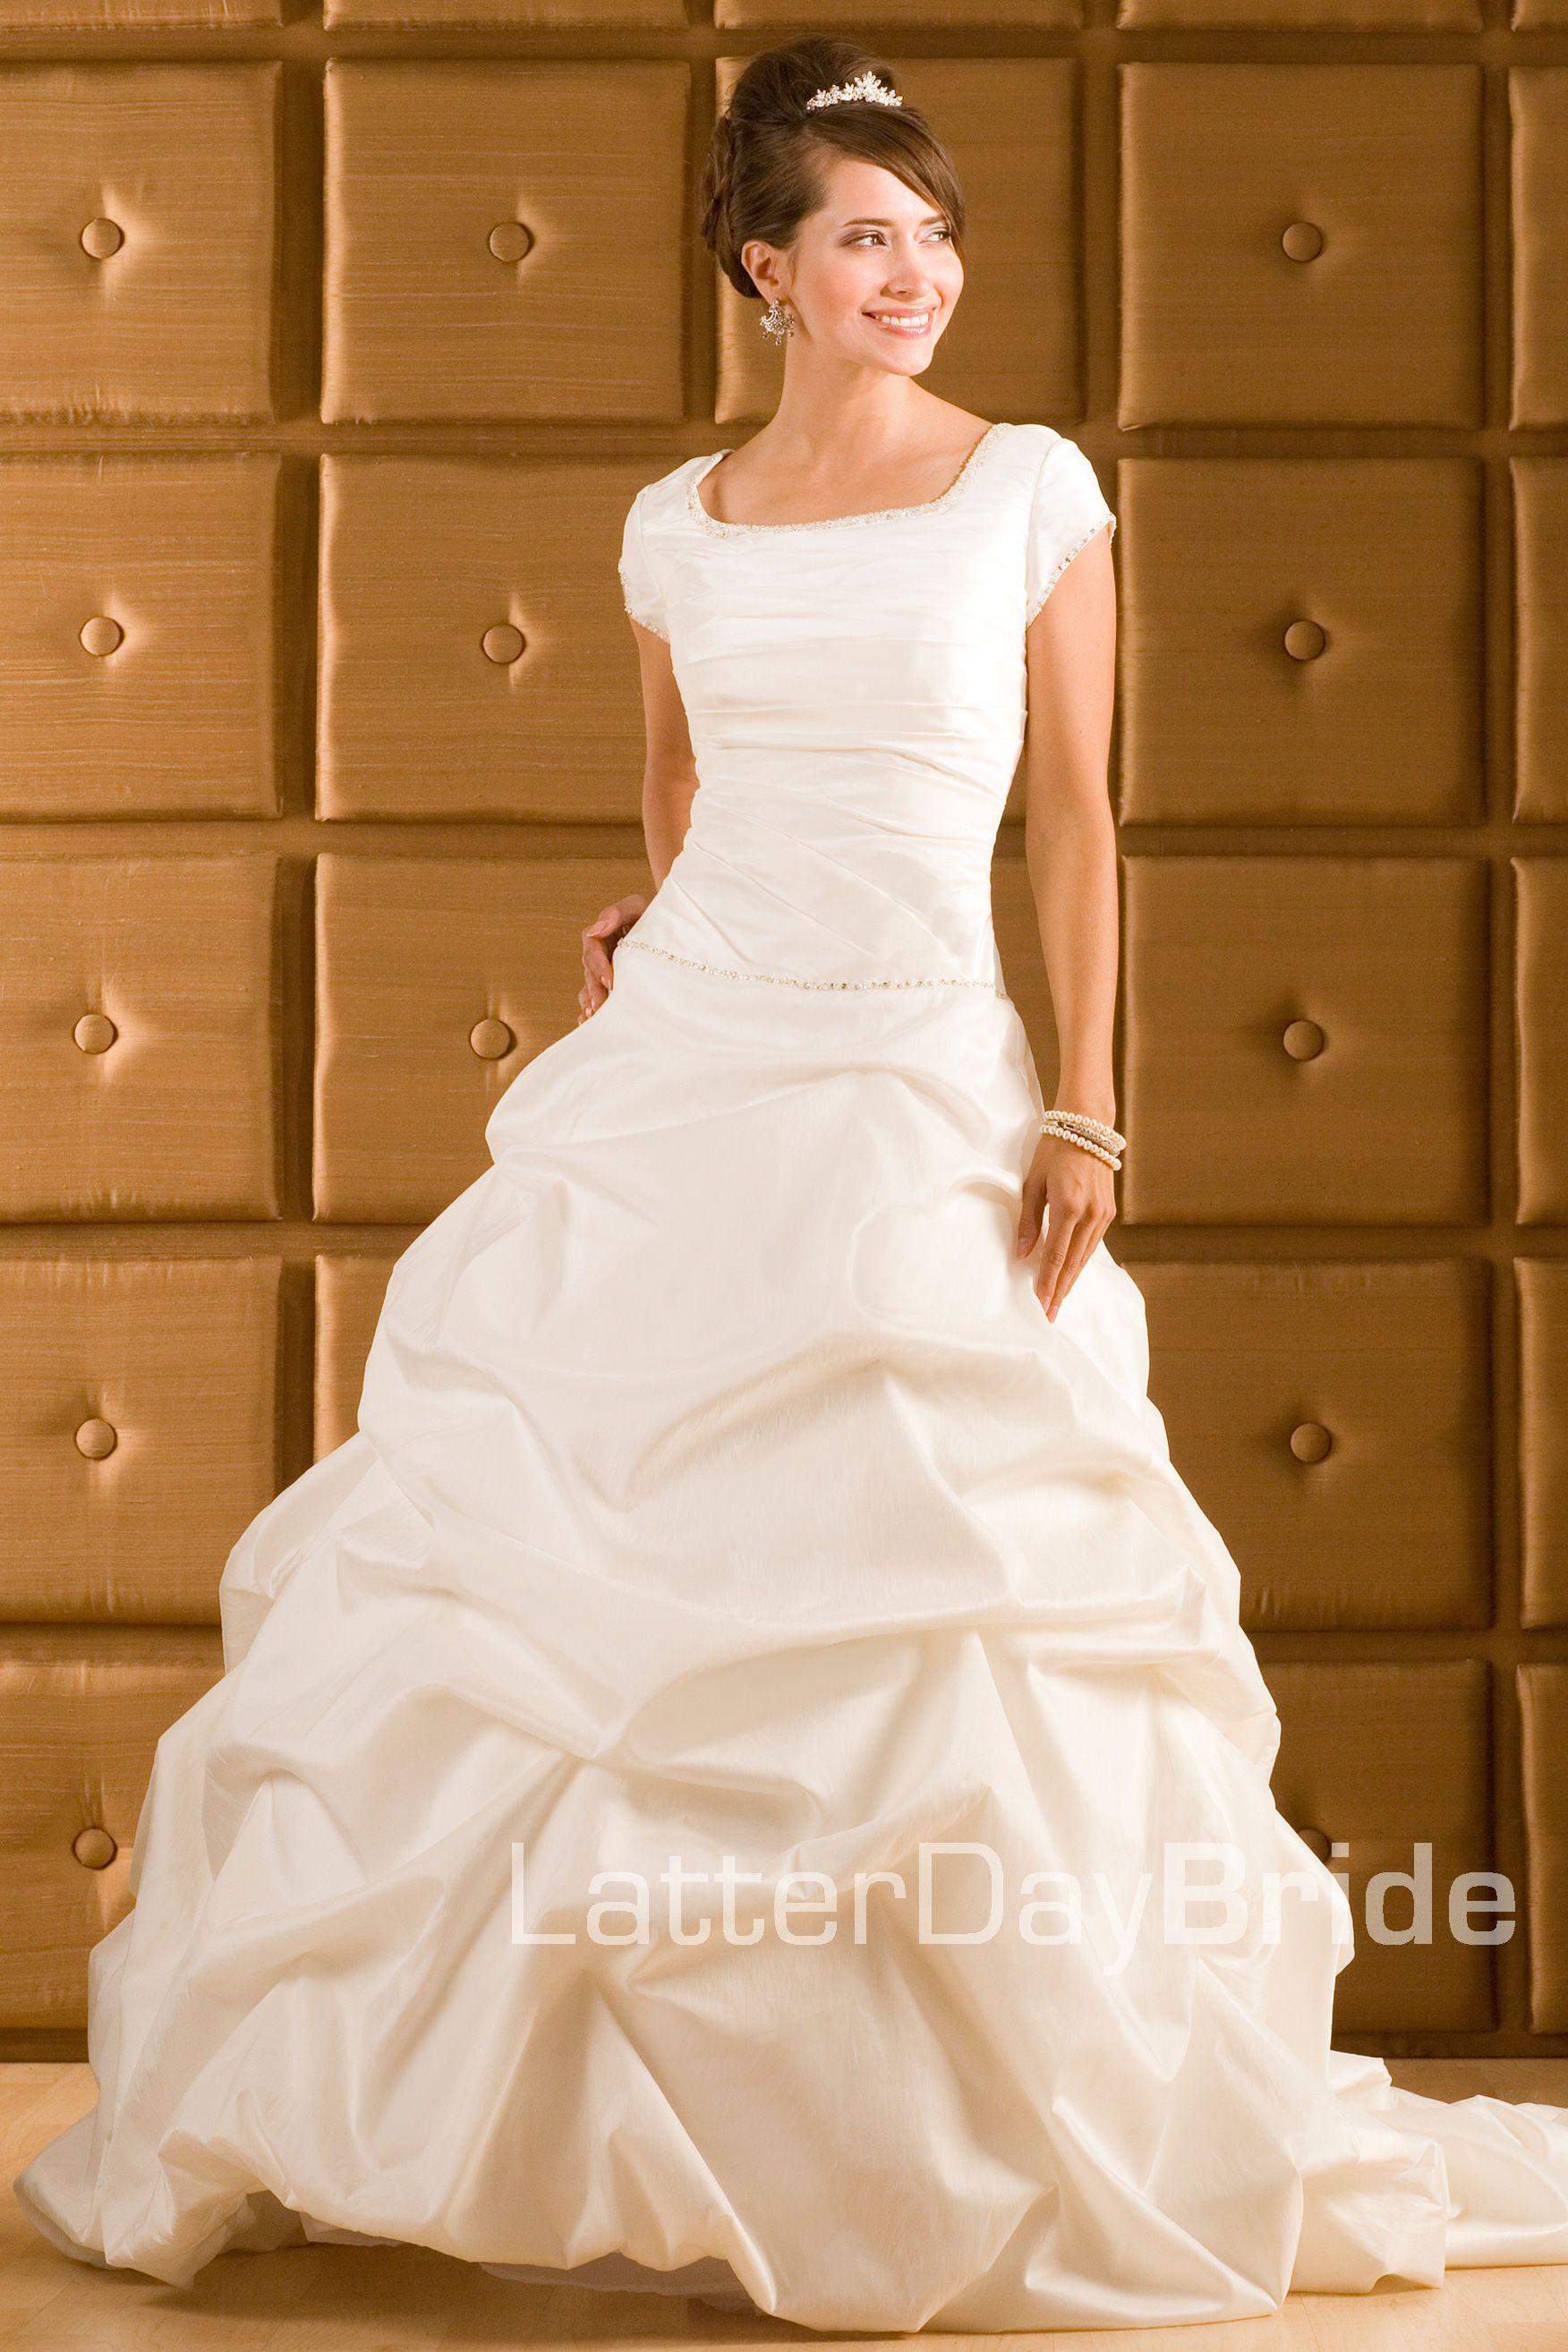 Modest Wedding Dress, Celine, LatterDayBride. All time favorite ...